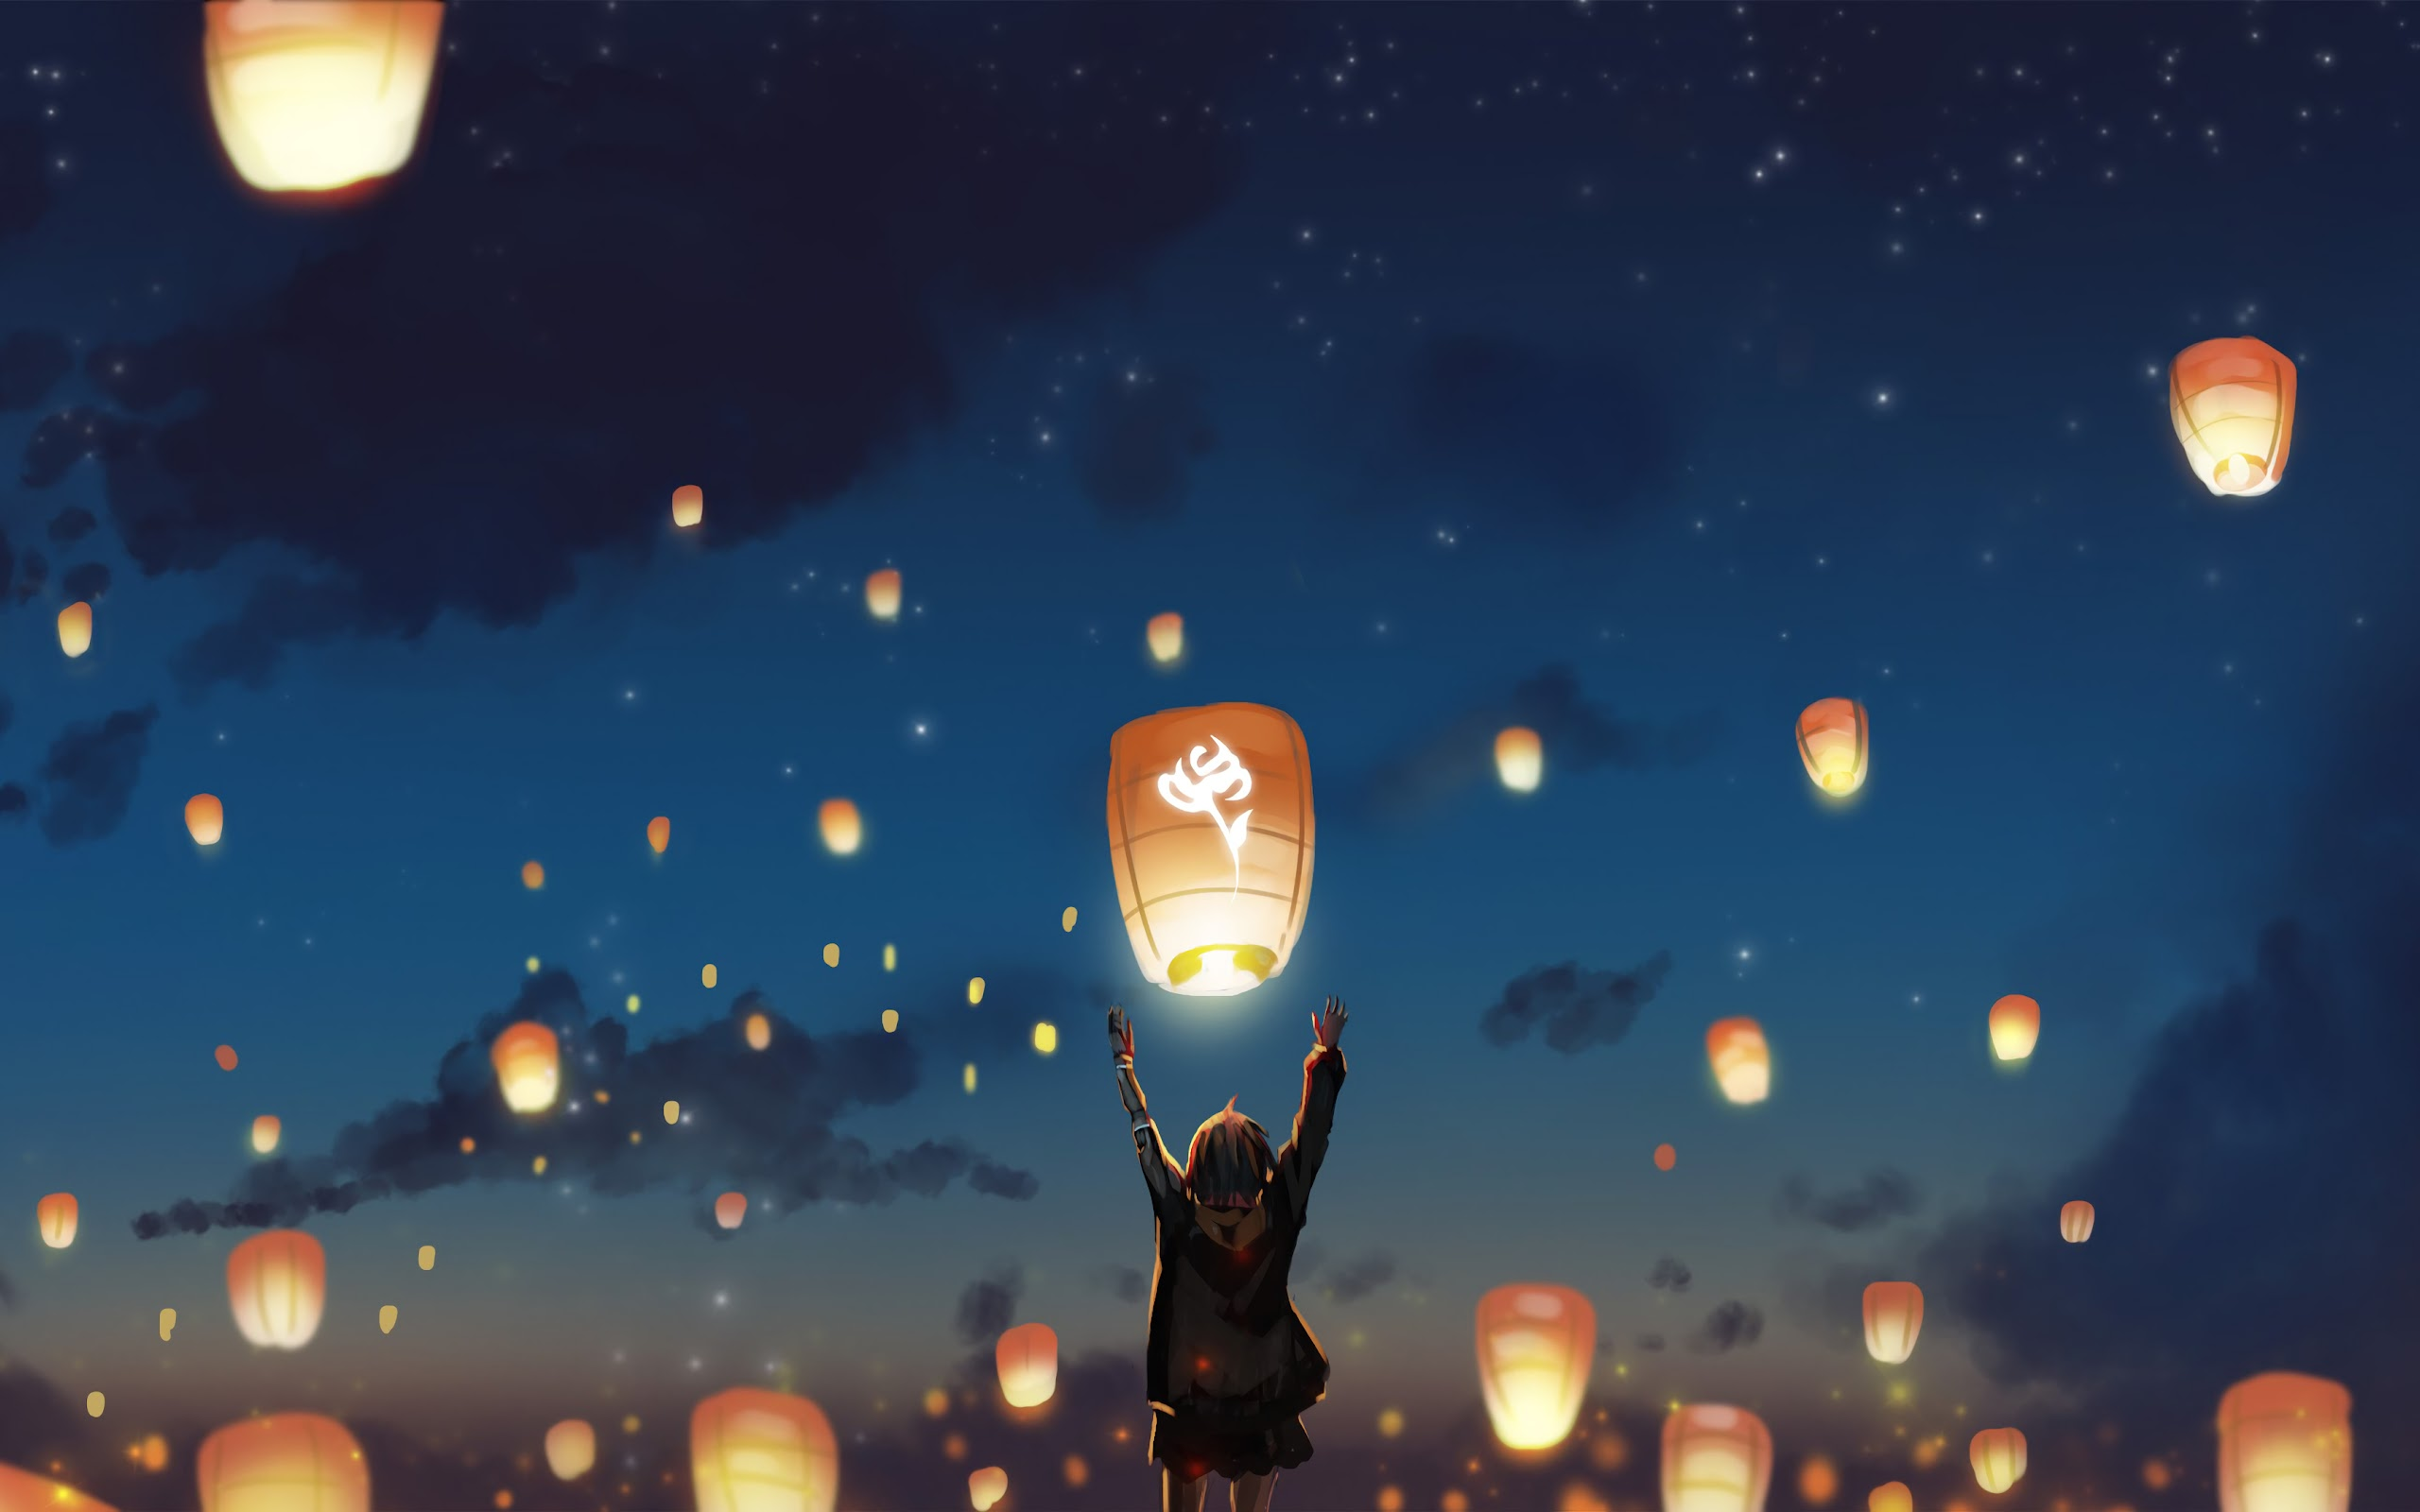 sky lantern scenery anime uhdpaper.com 4K 133